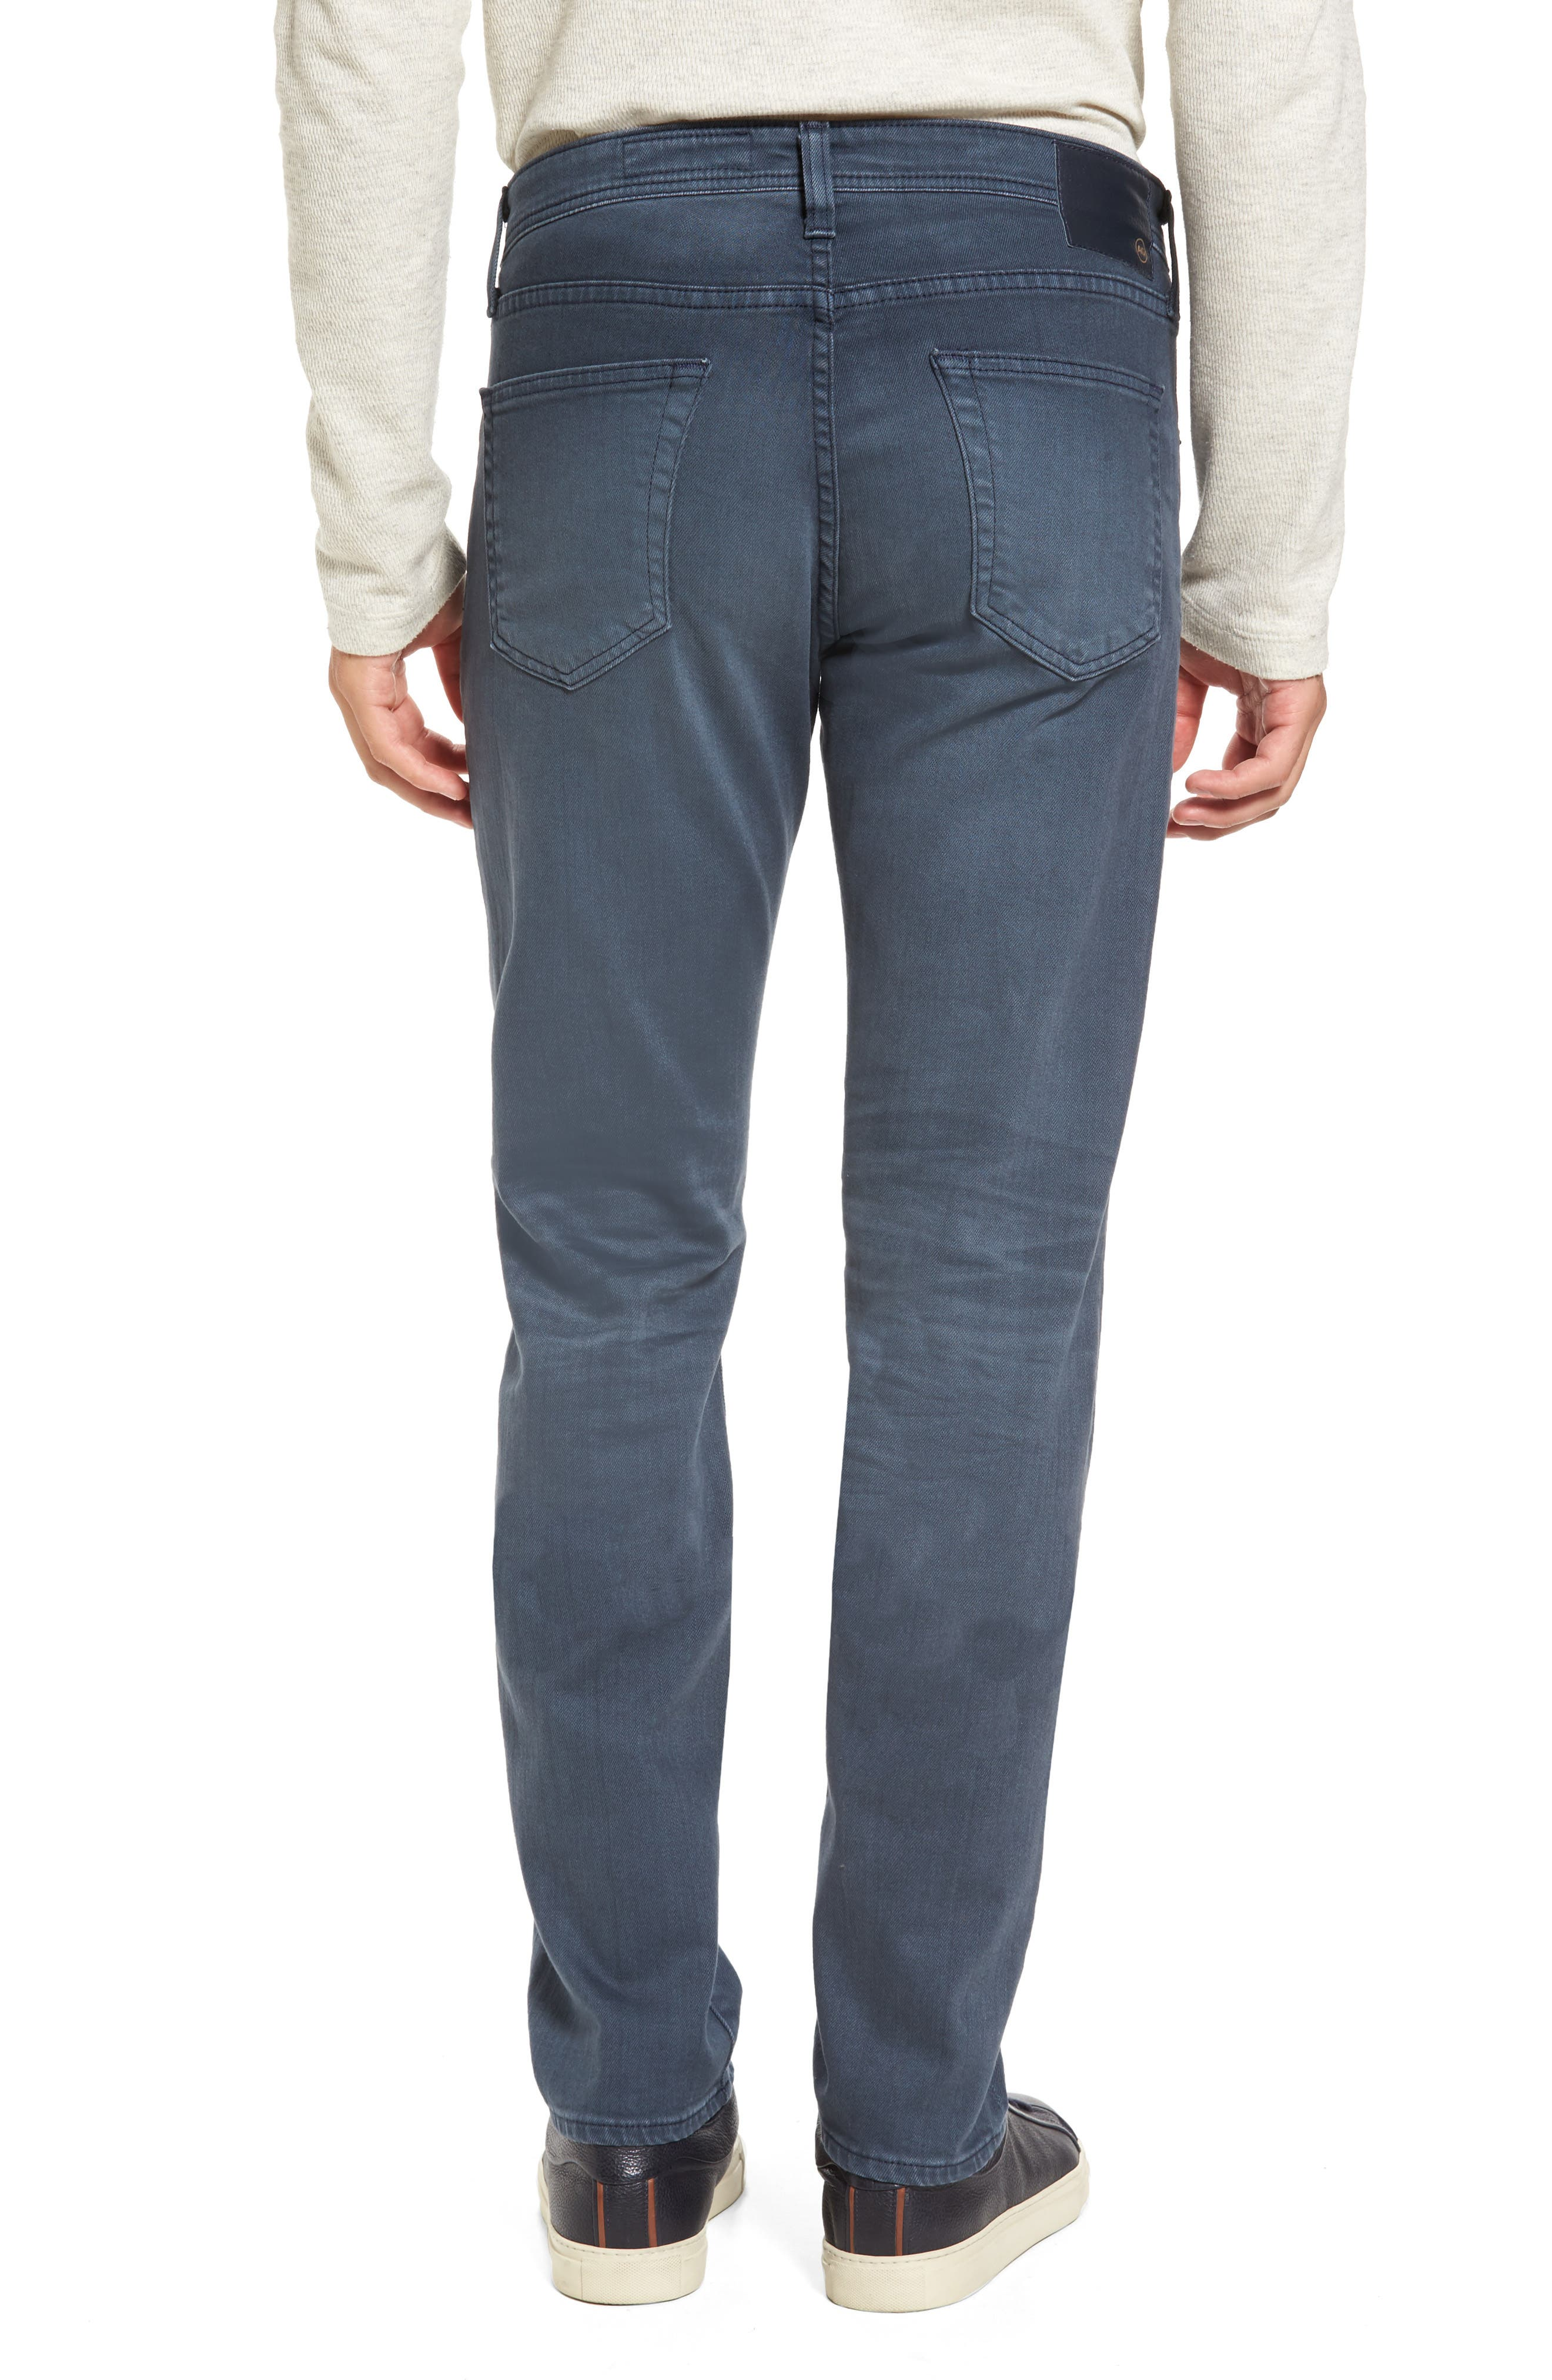 Tellis Slim Fit Jeans,                             Alternate thumbnail 2, color,                             425